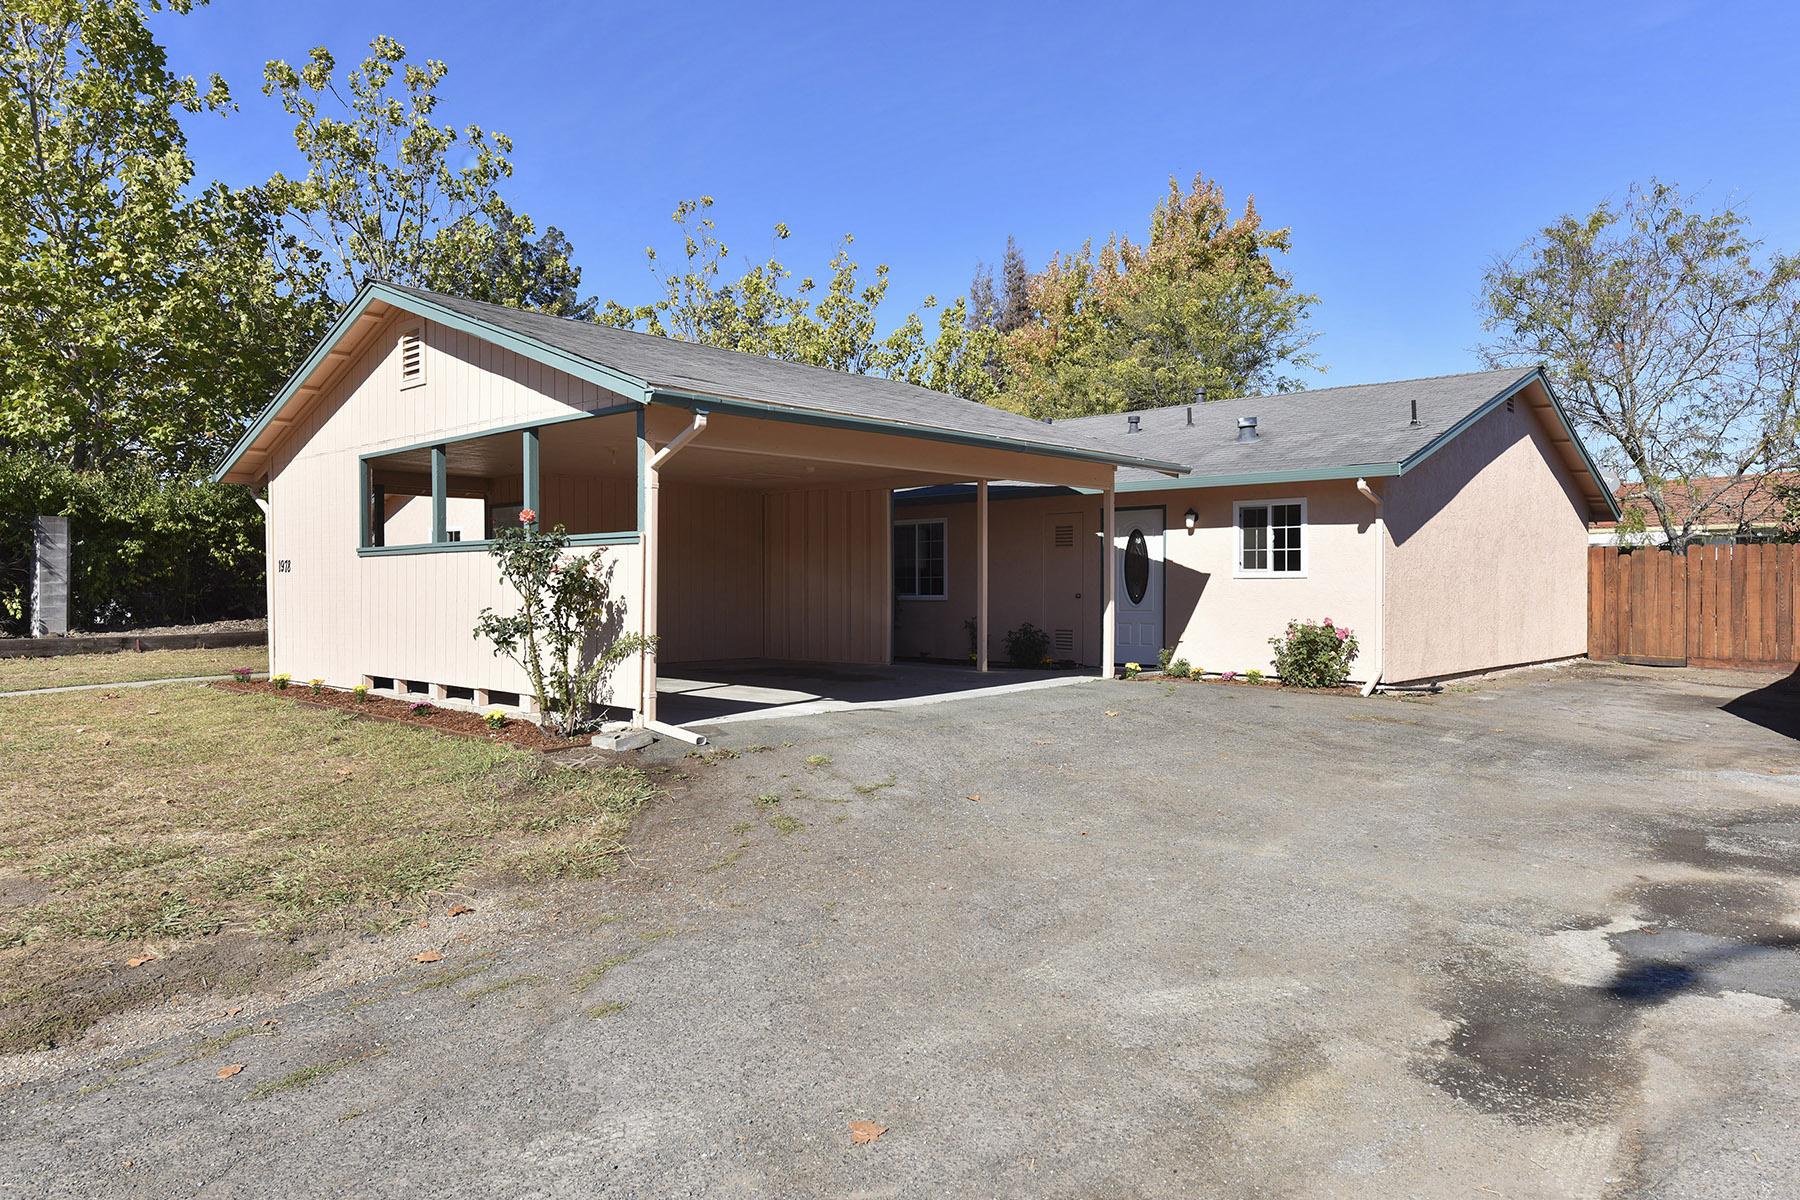 Casa Multifamiliar por un Venta en A Charming Duplex with a Spacious Backyard 1974 Trower Ave Napa, California, 94558 Estados Unidos